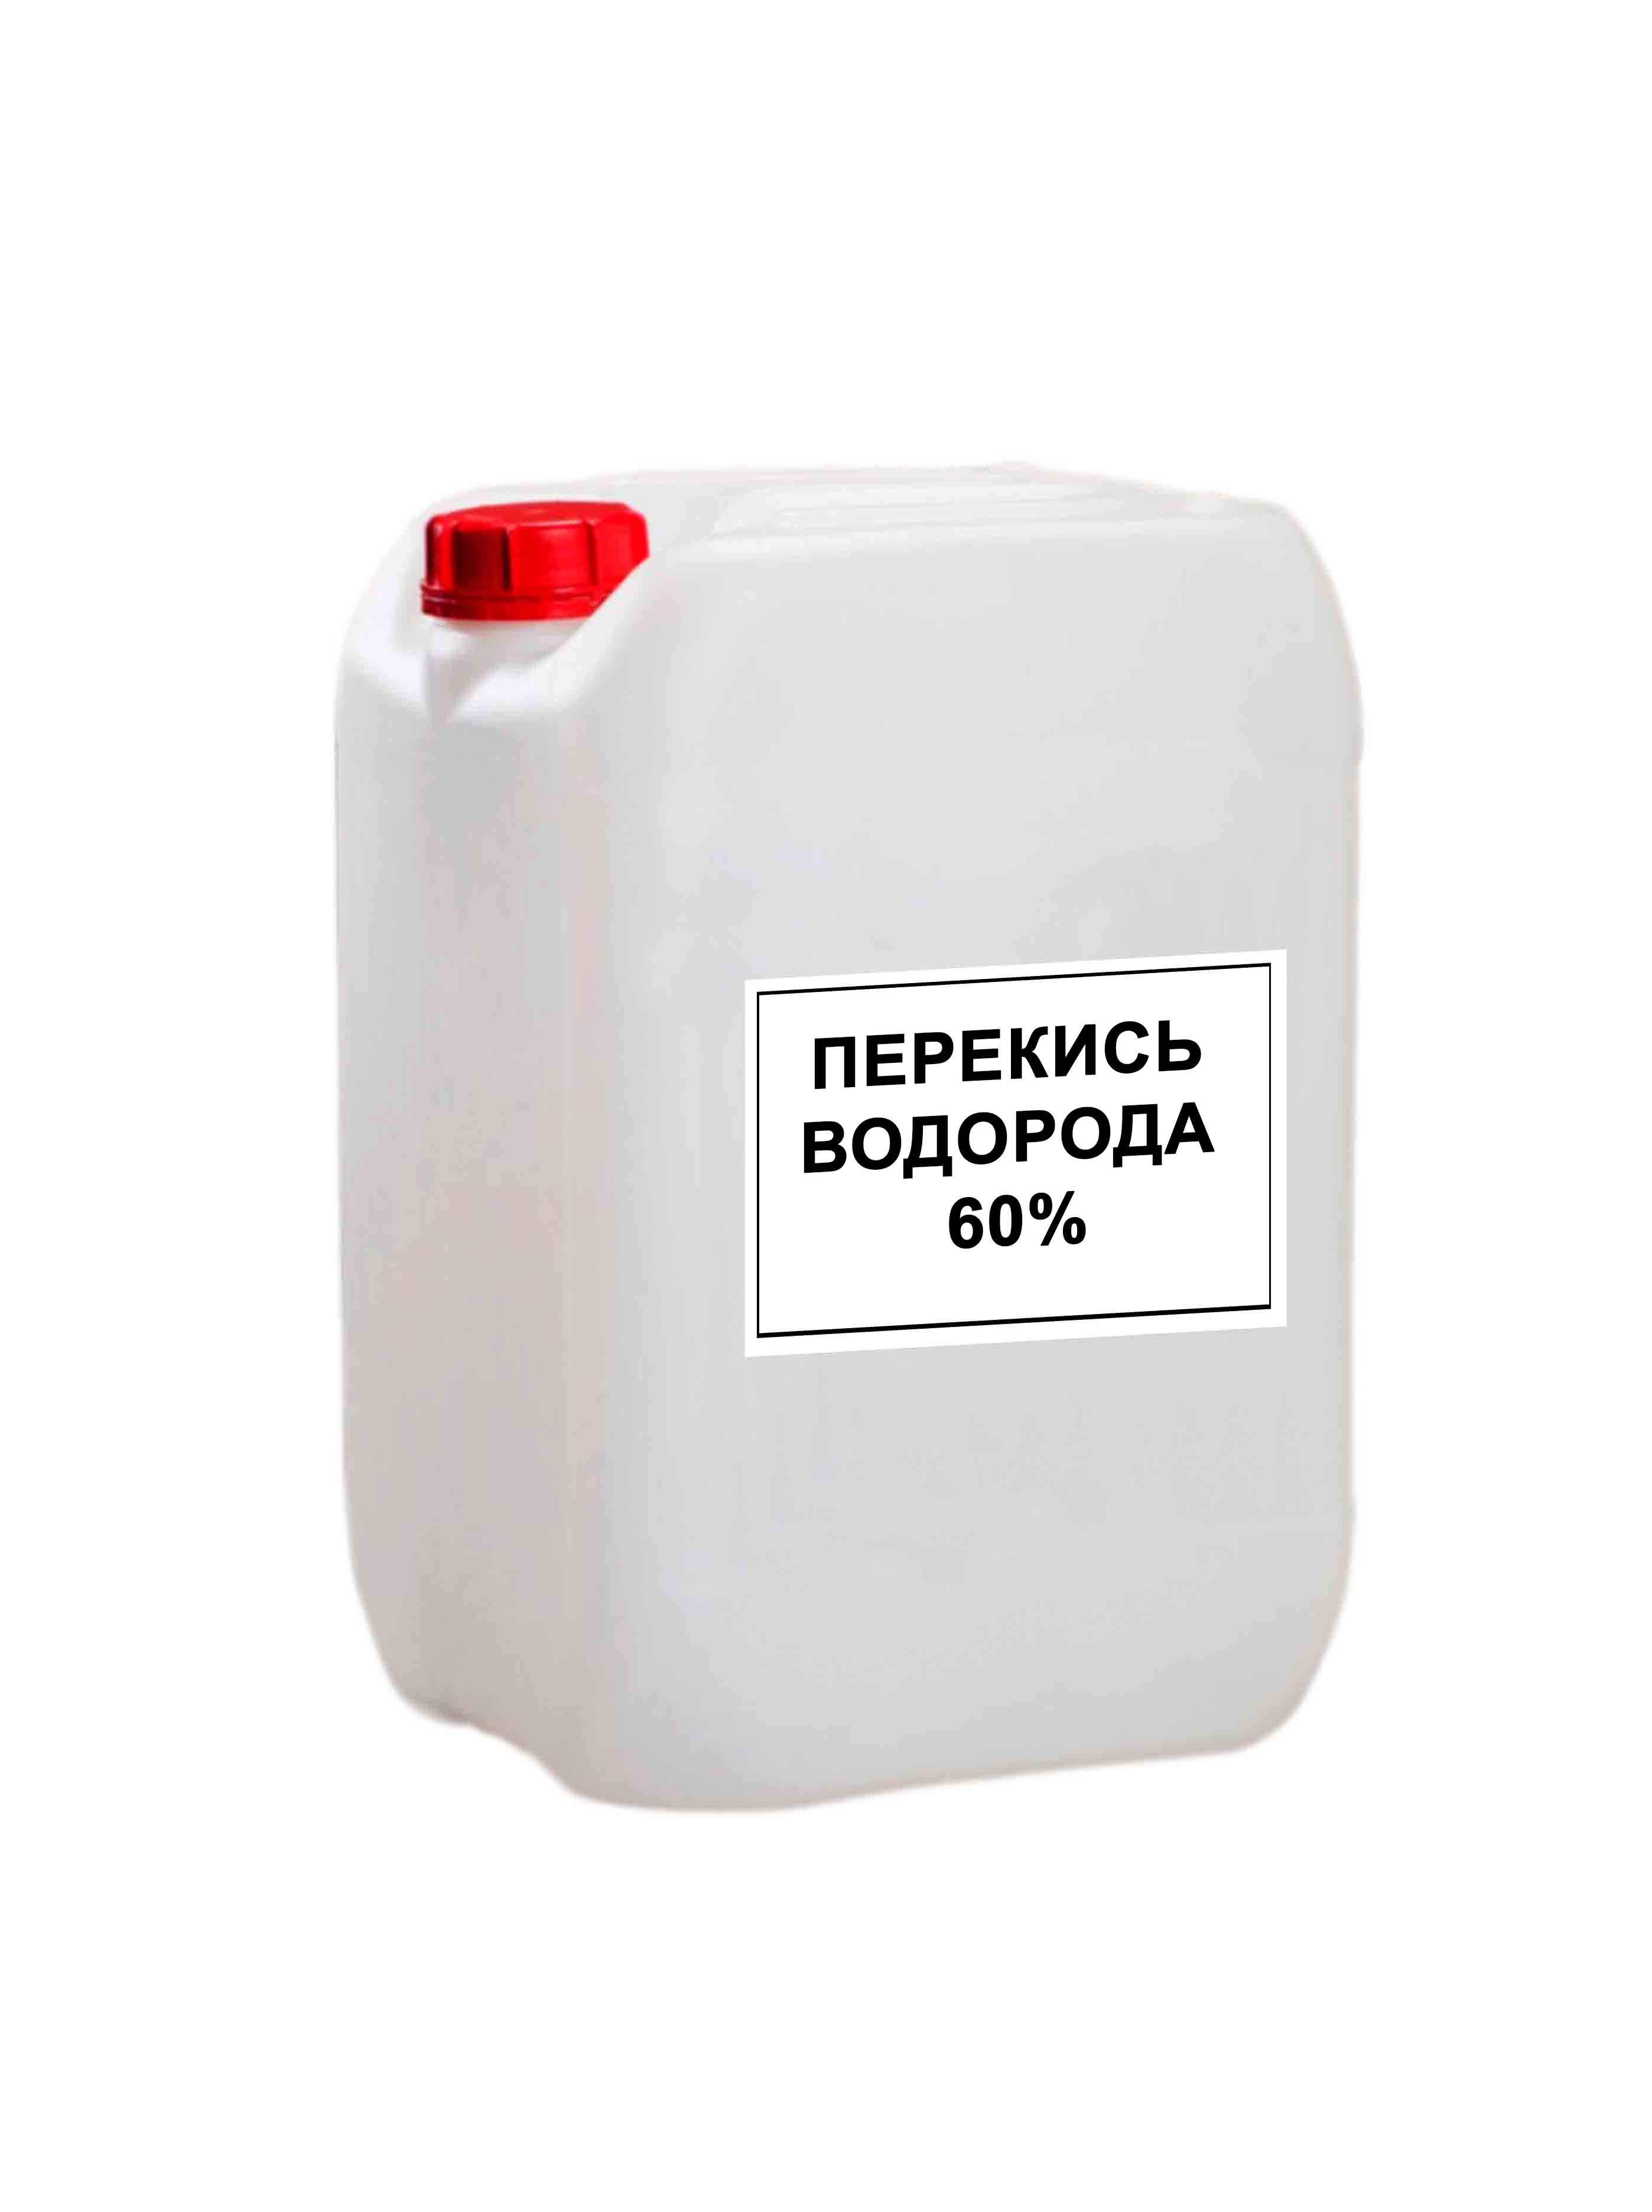 Перекись водорода 60%